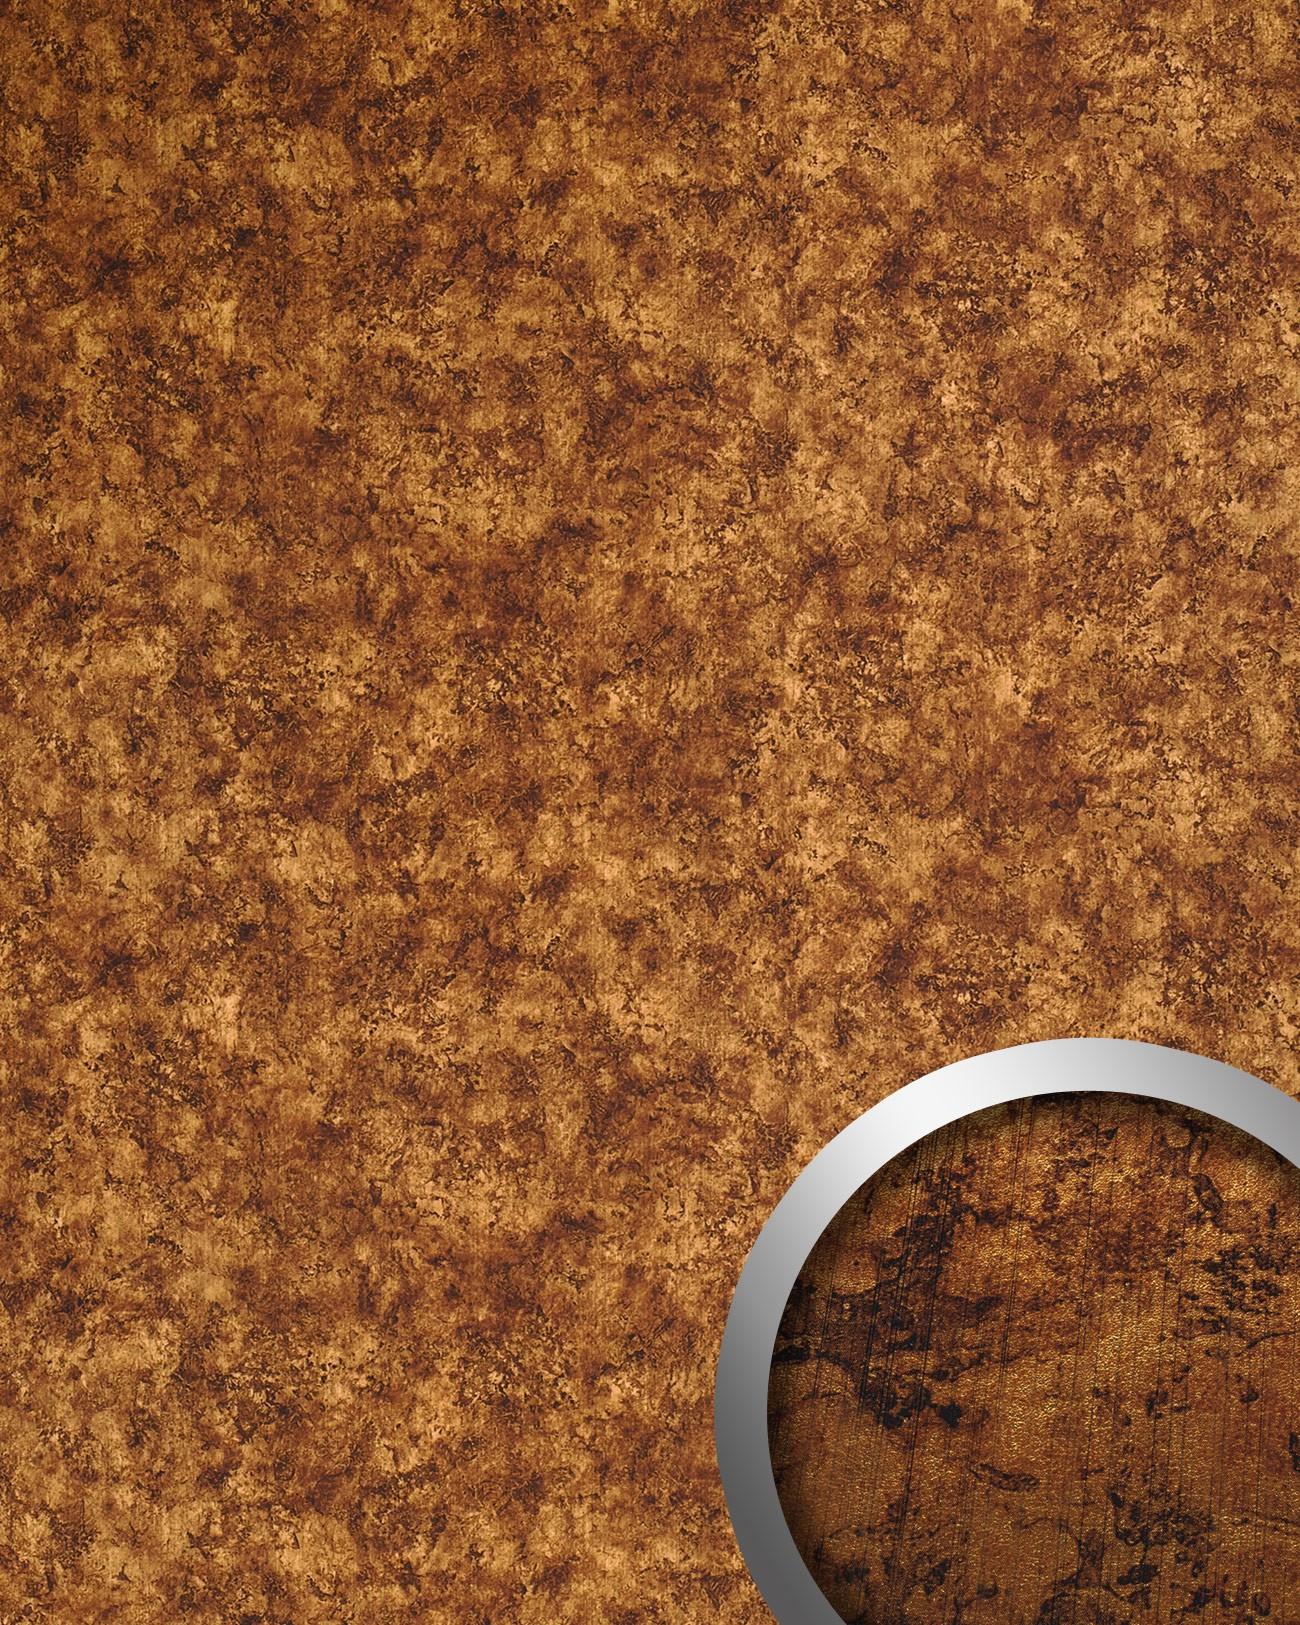 Kupfer Rost wandverkleidung 17277 deco vintage metall rost optik kupfer braun